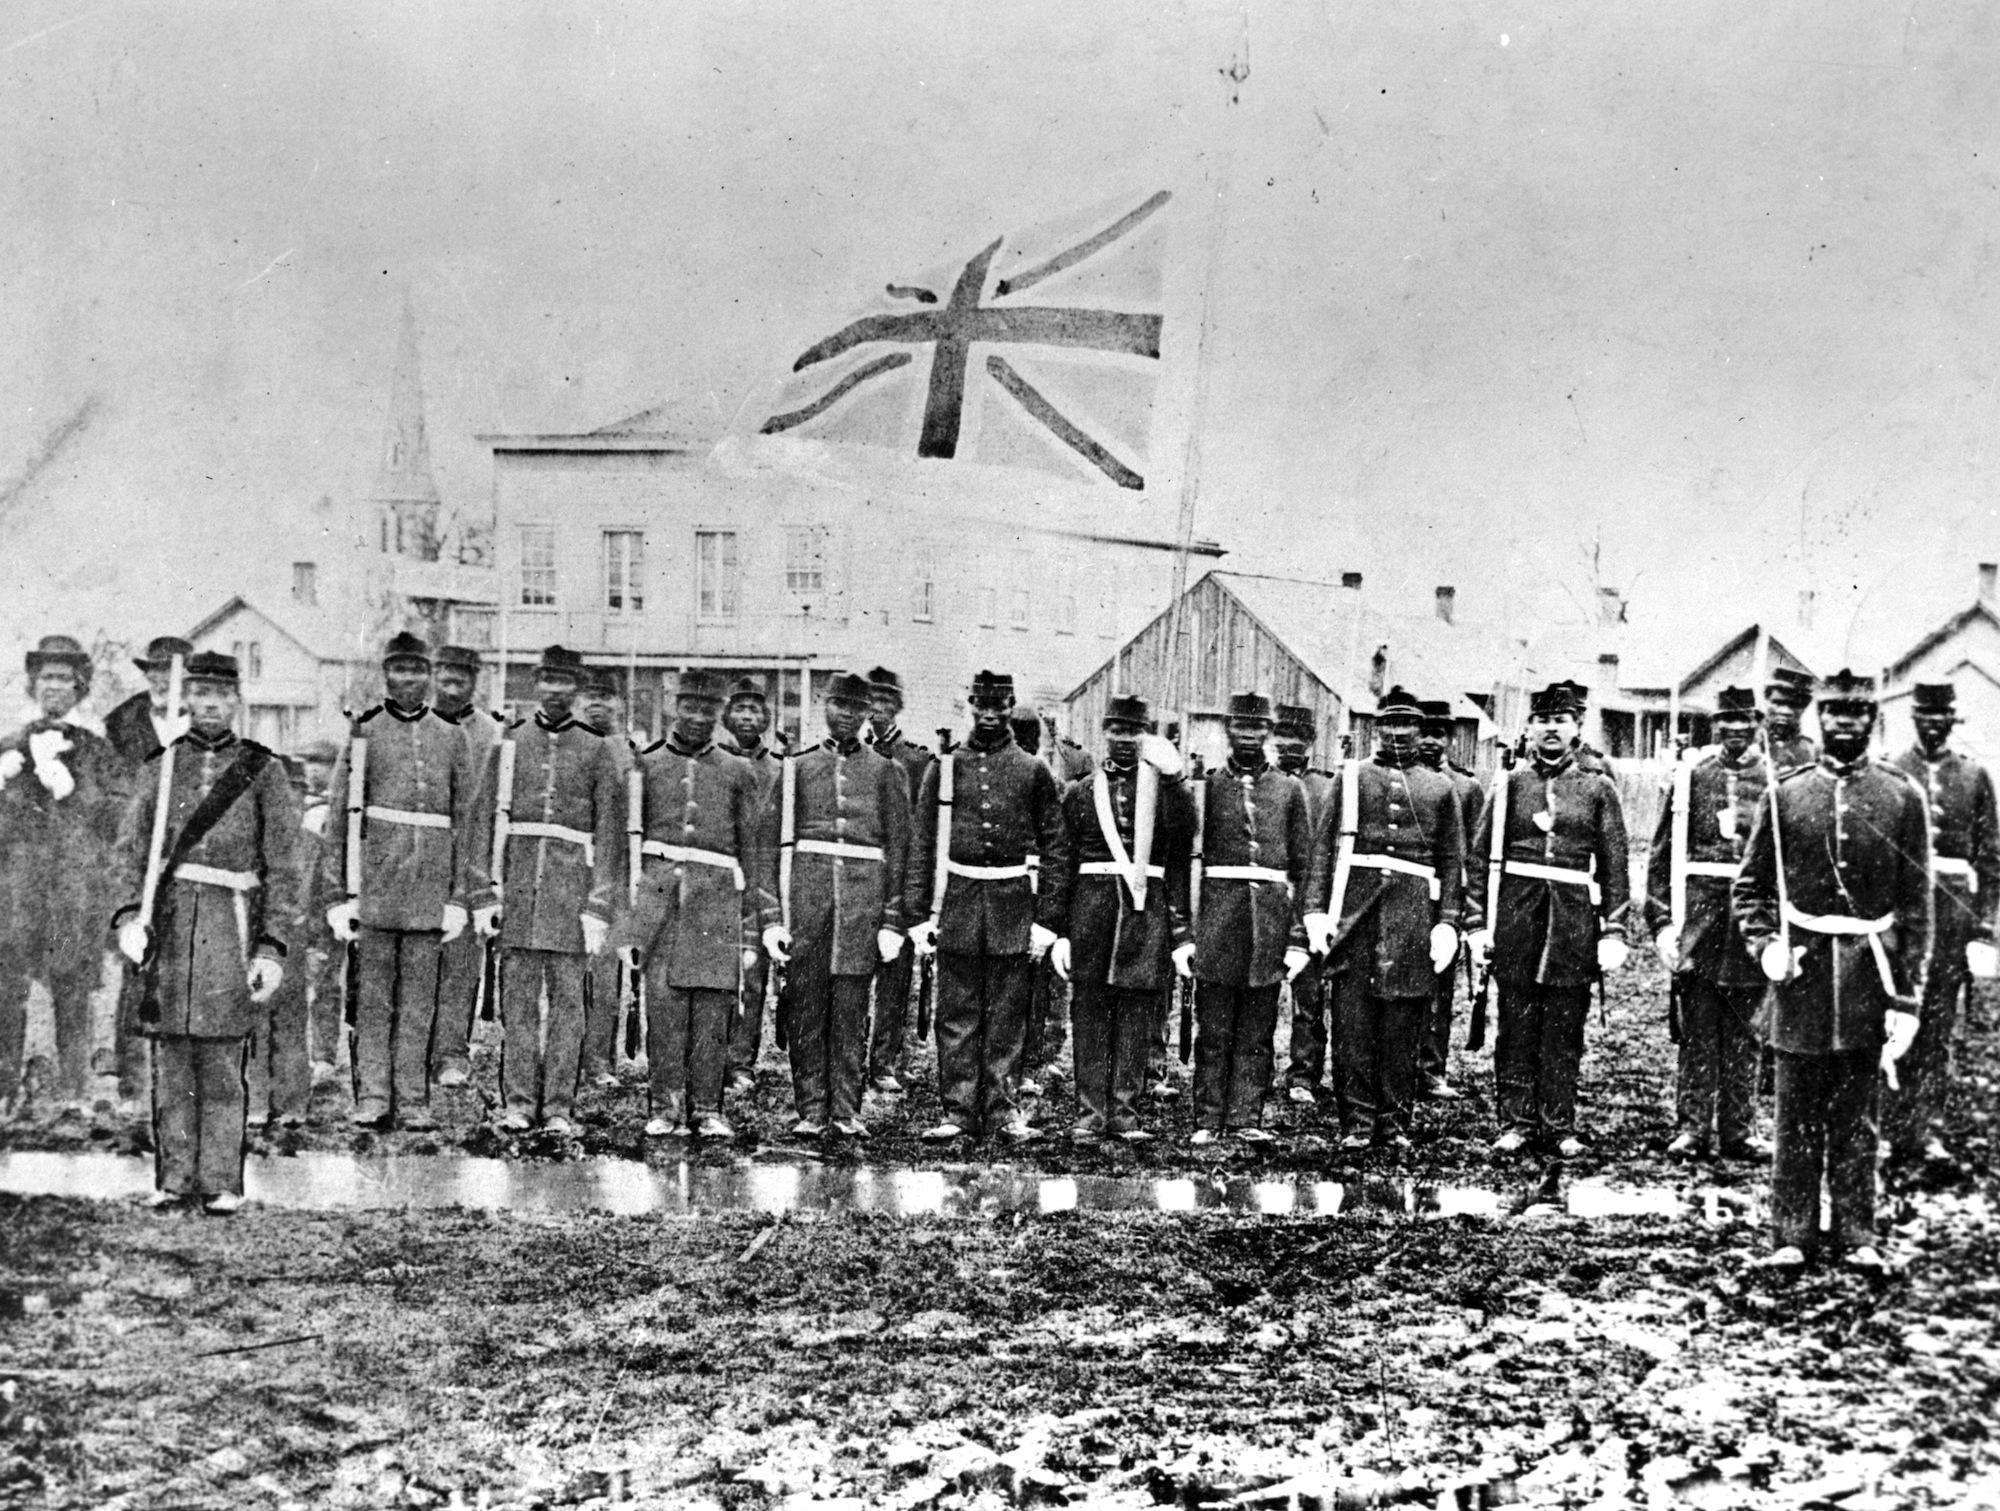 Victoria Pioneer Rifle Corps